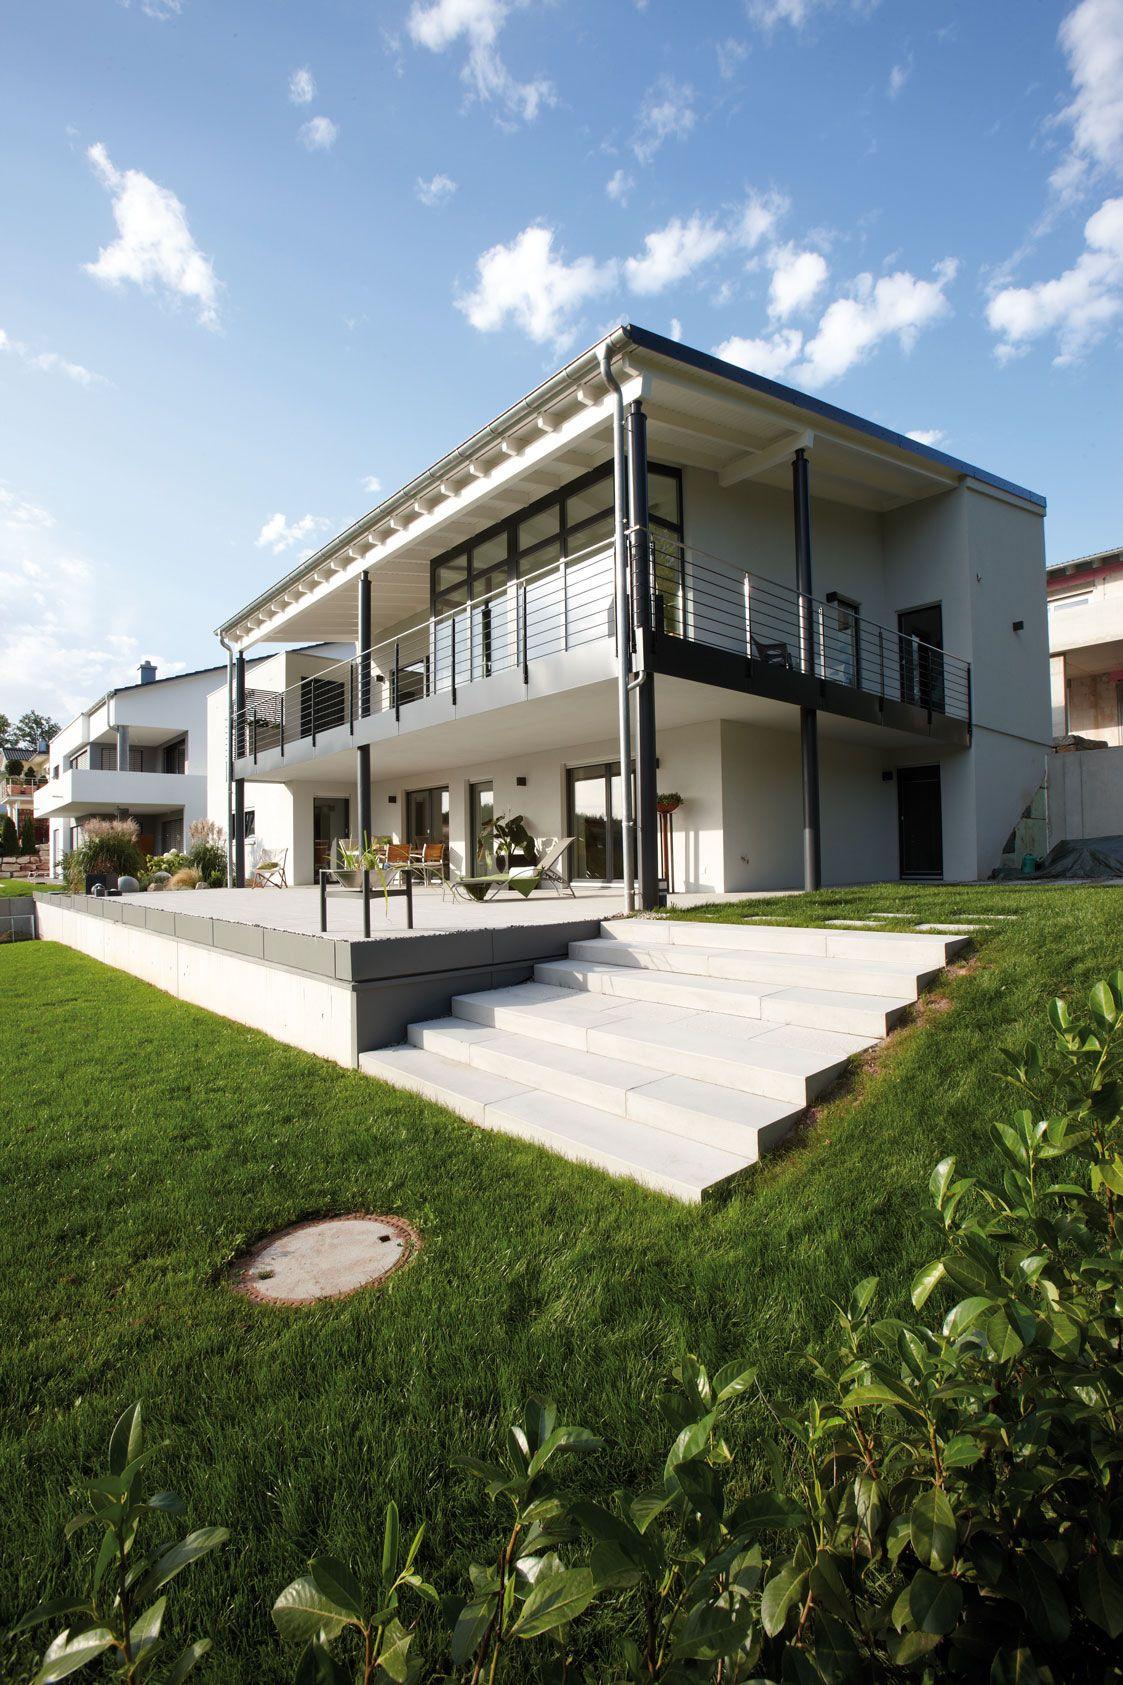 bien zenker oder fingerhaus ückansicht des Luxus Hanghauses von rechts  infamilienhaus ...